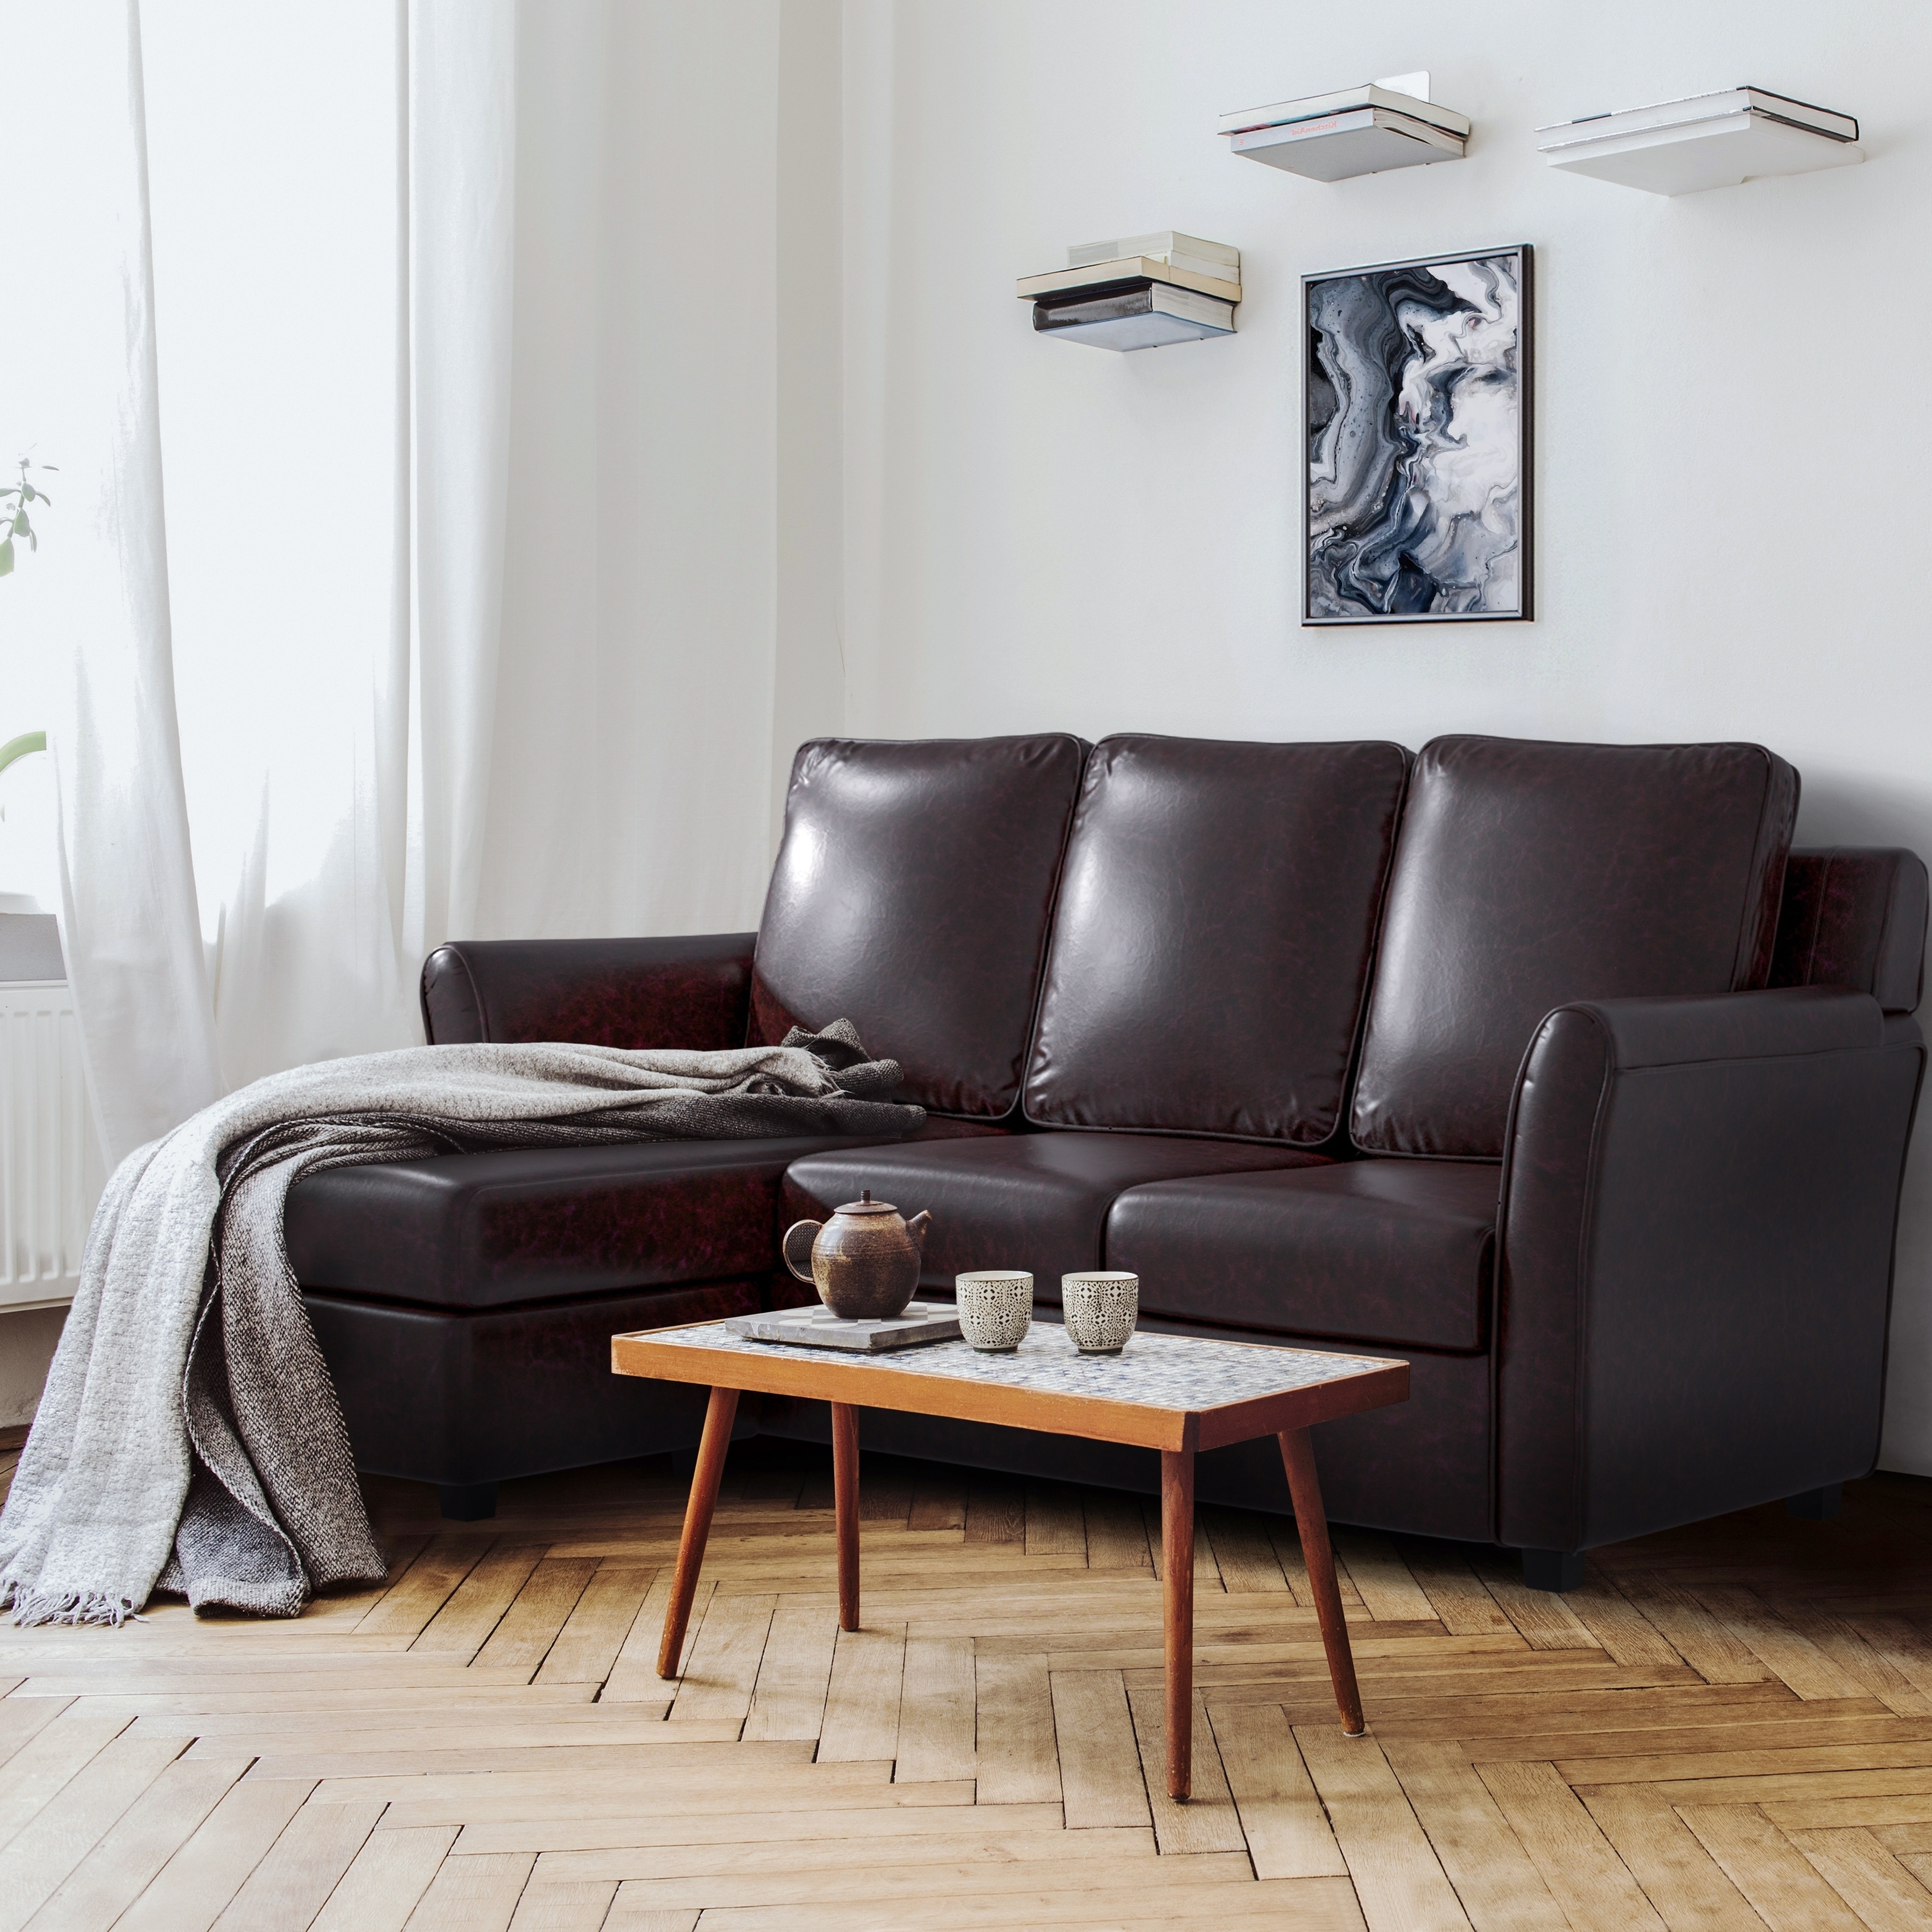 Furniture Of America Burton Modern L Shaped Sectional